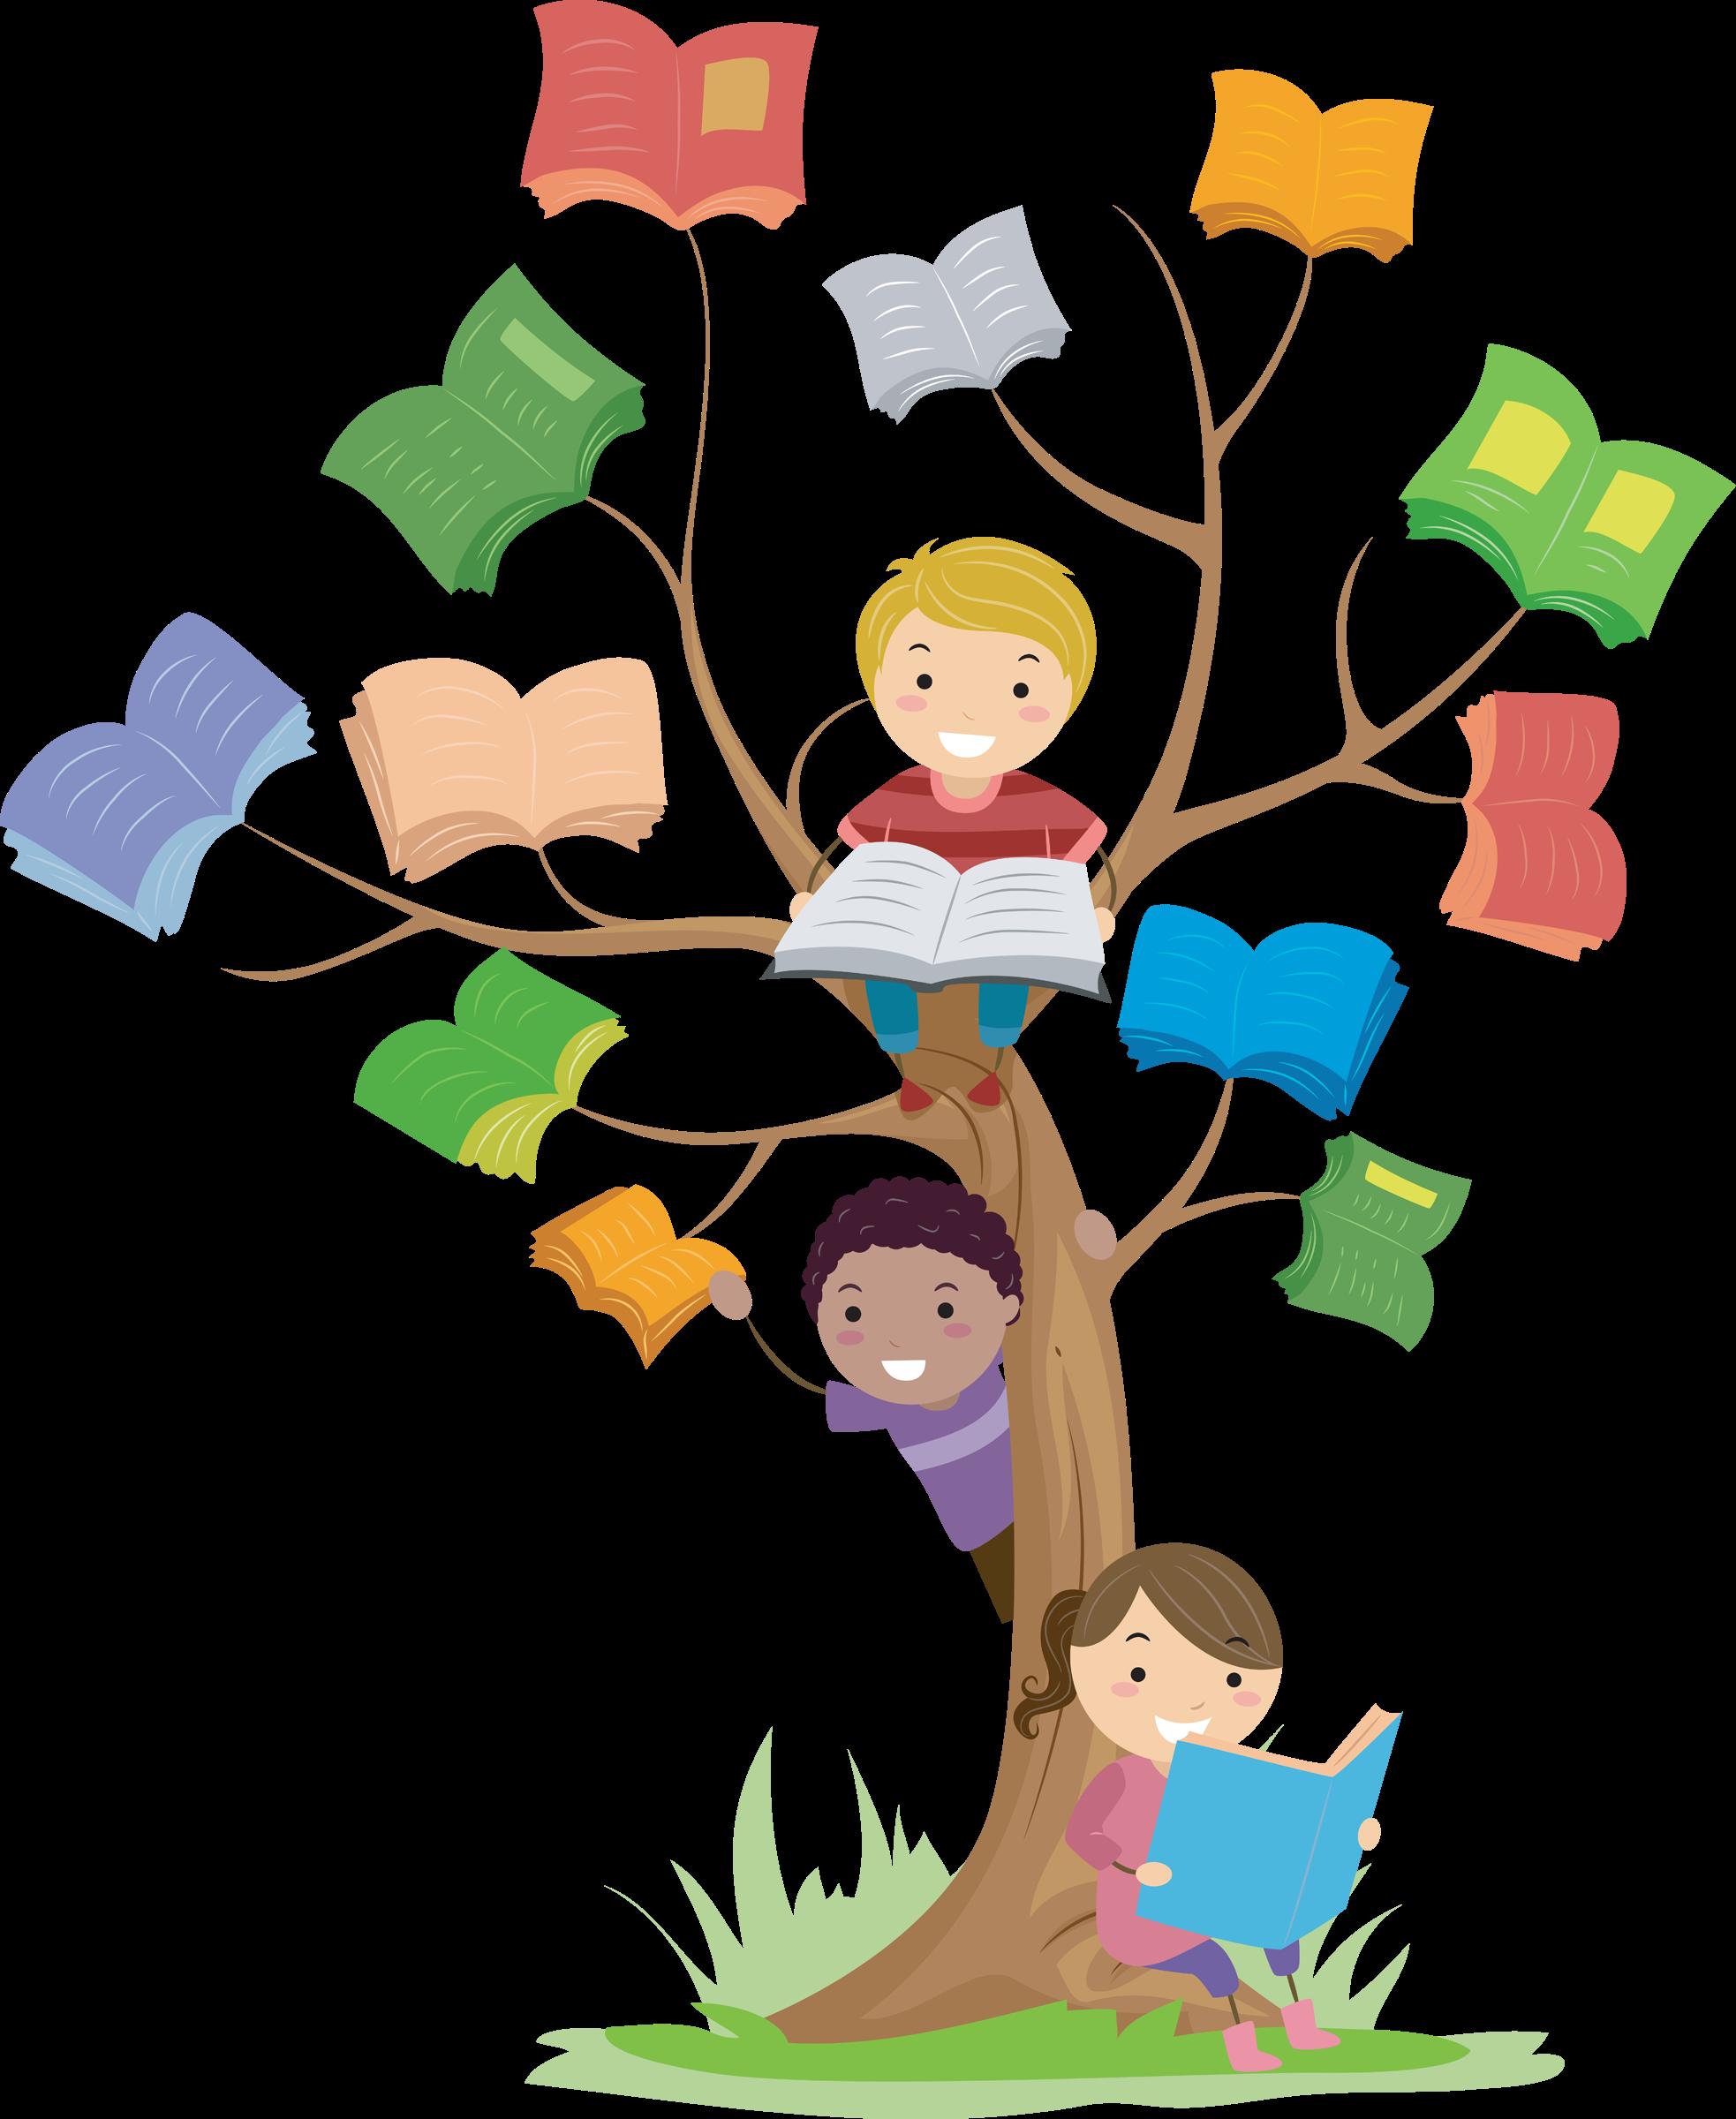 Stress clipart learner. Brain based learning approach